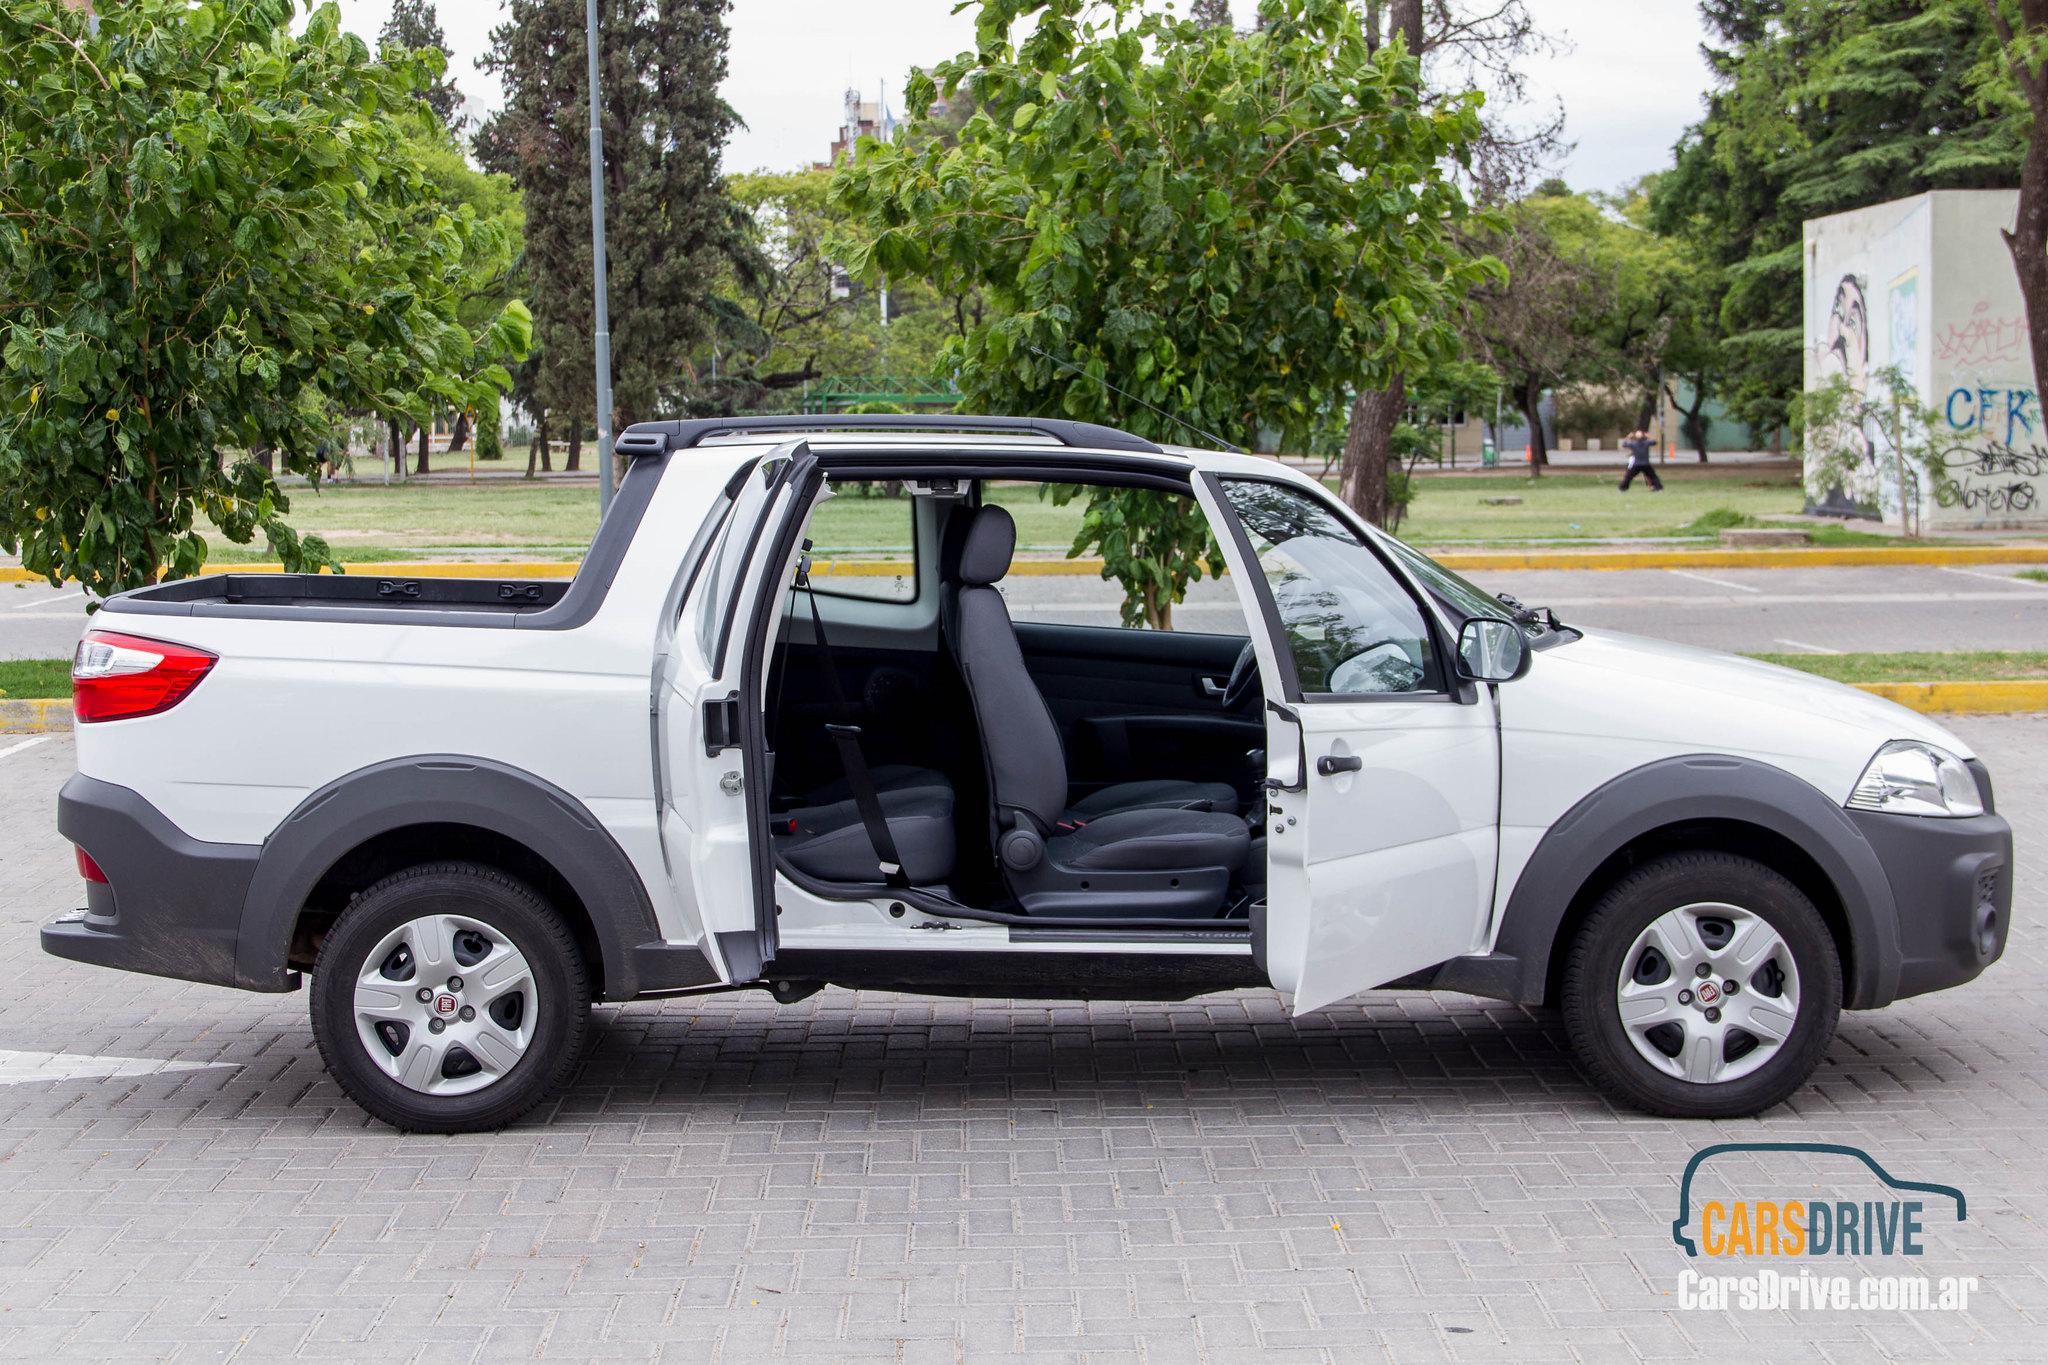 CarsDrive Córdoba Prueba de manejo: Fiat Strada Working 1.4 cabina ...